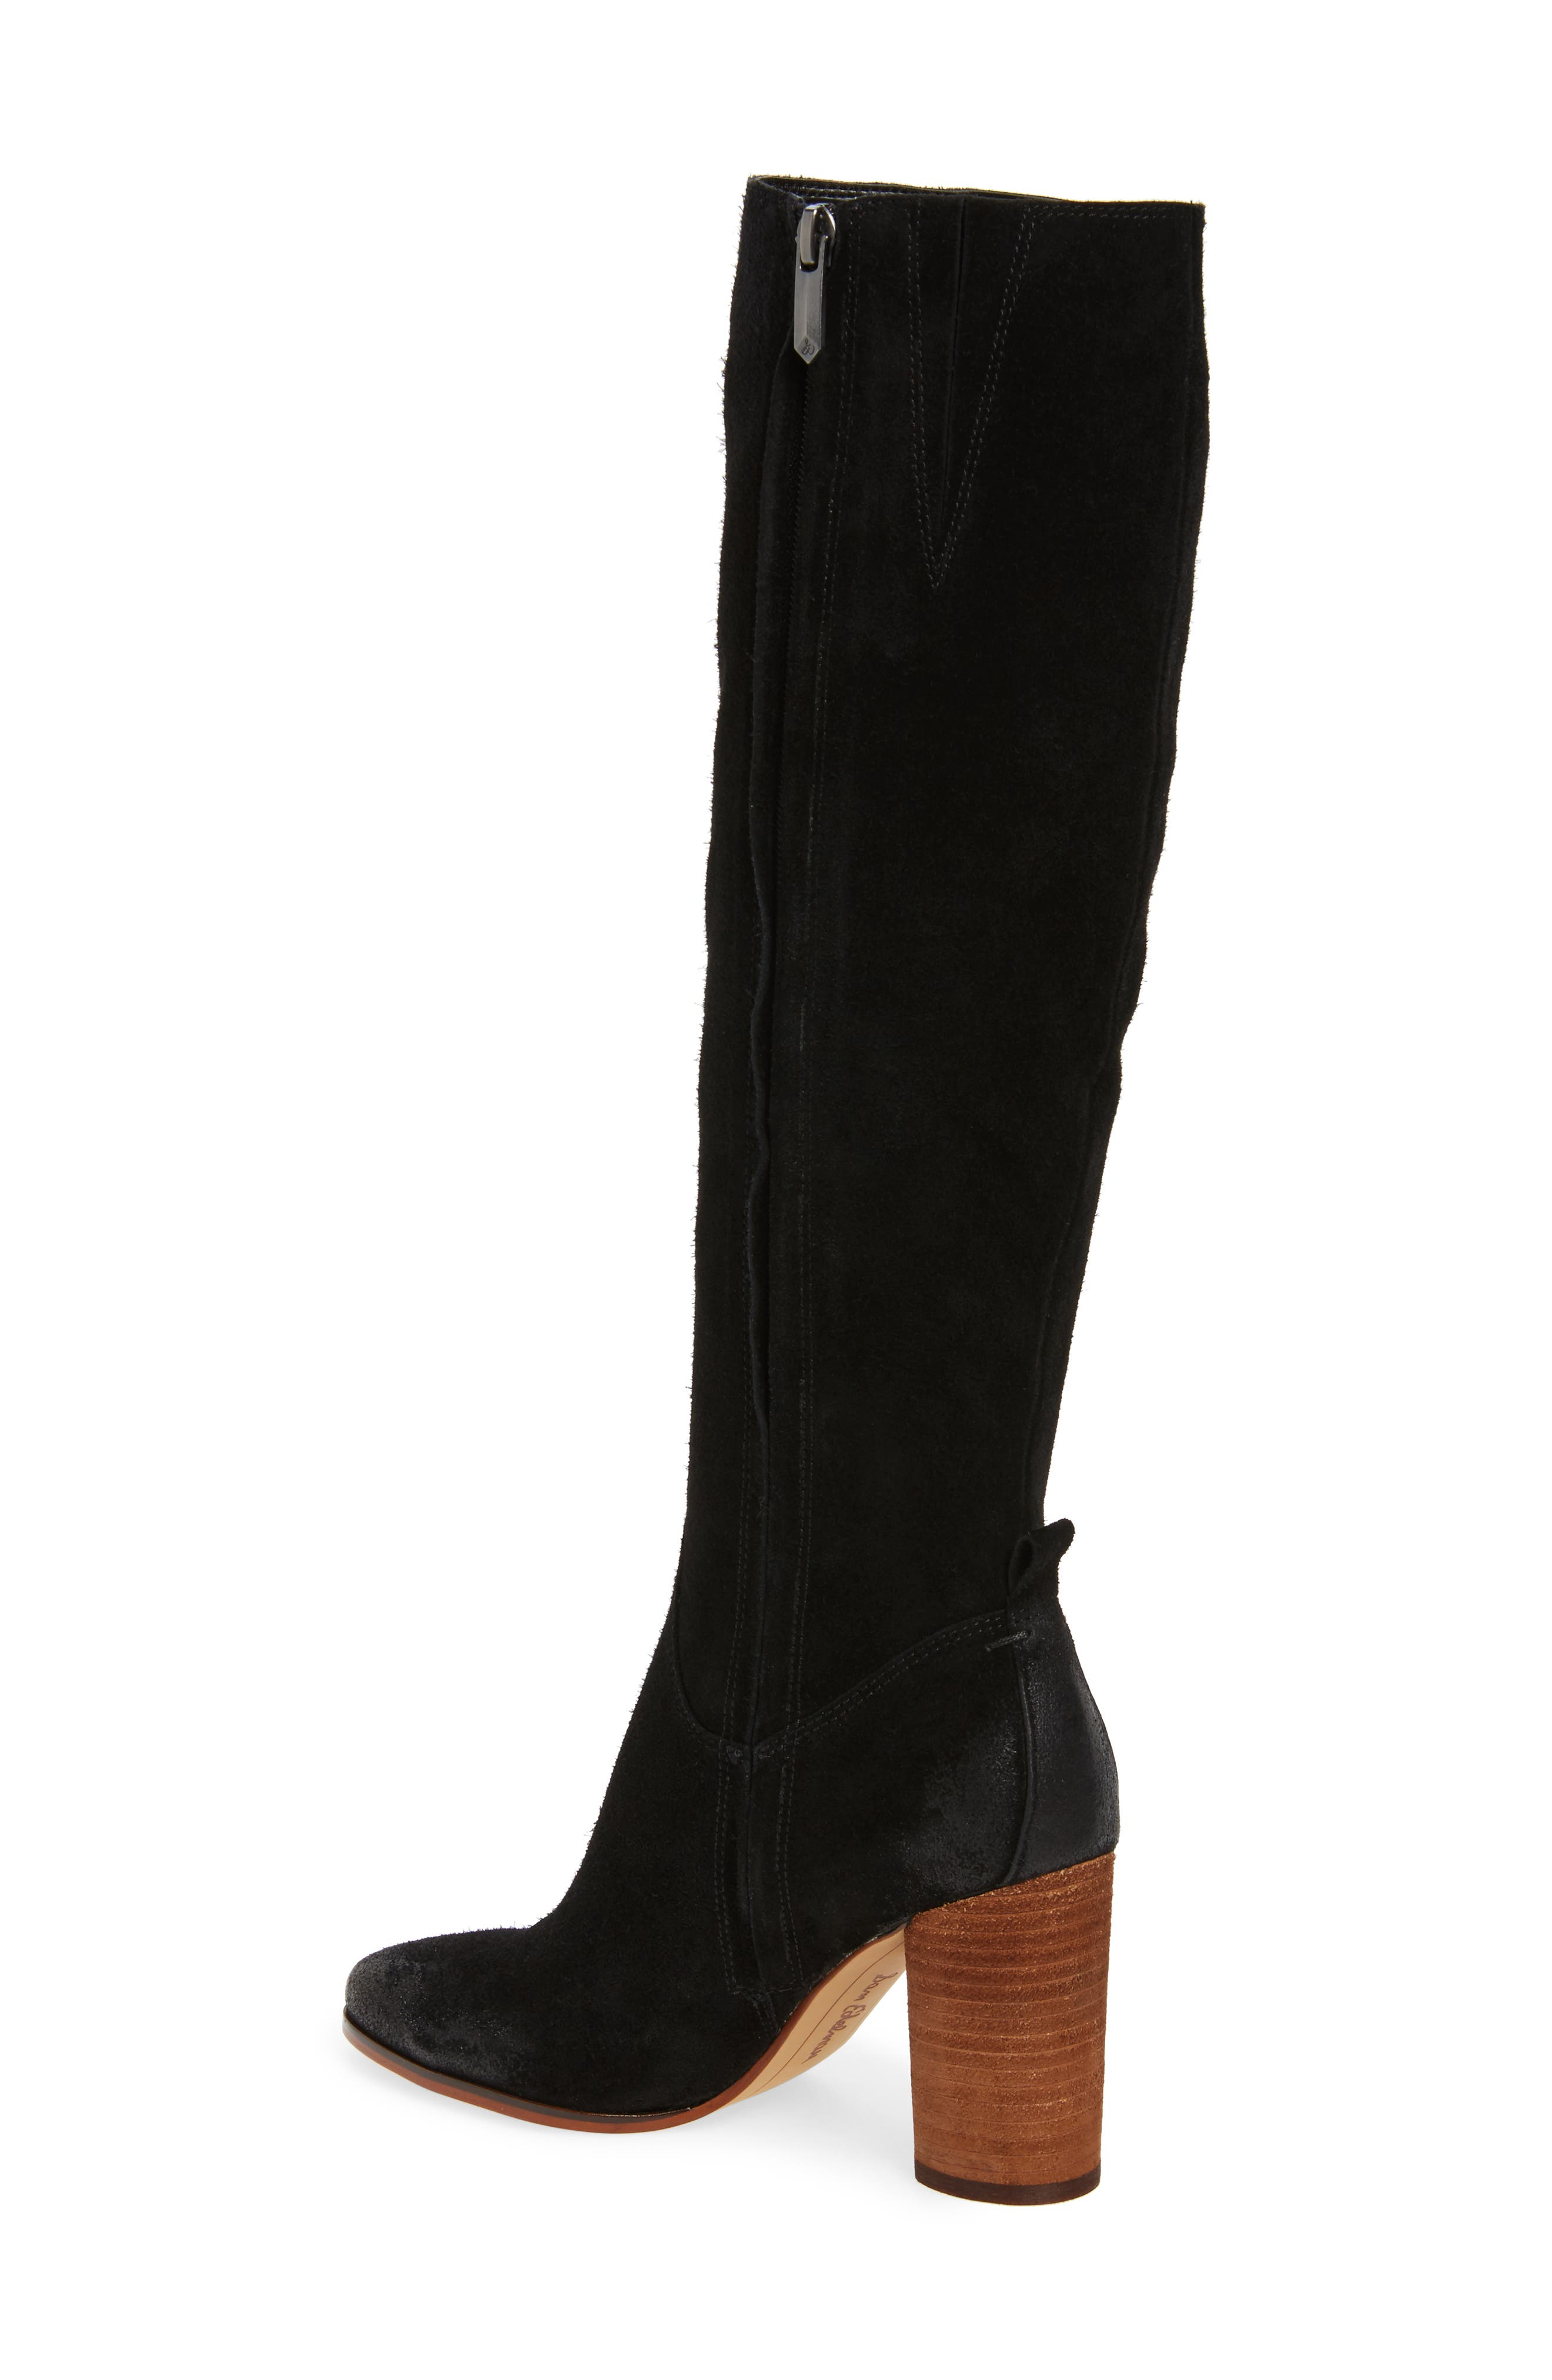 SAM EDELMAN, Camellia Tall Boot, Alternate thumbnail 2, color, 002